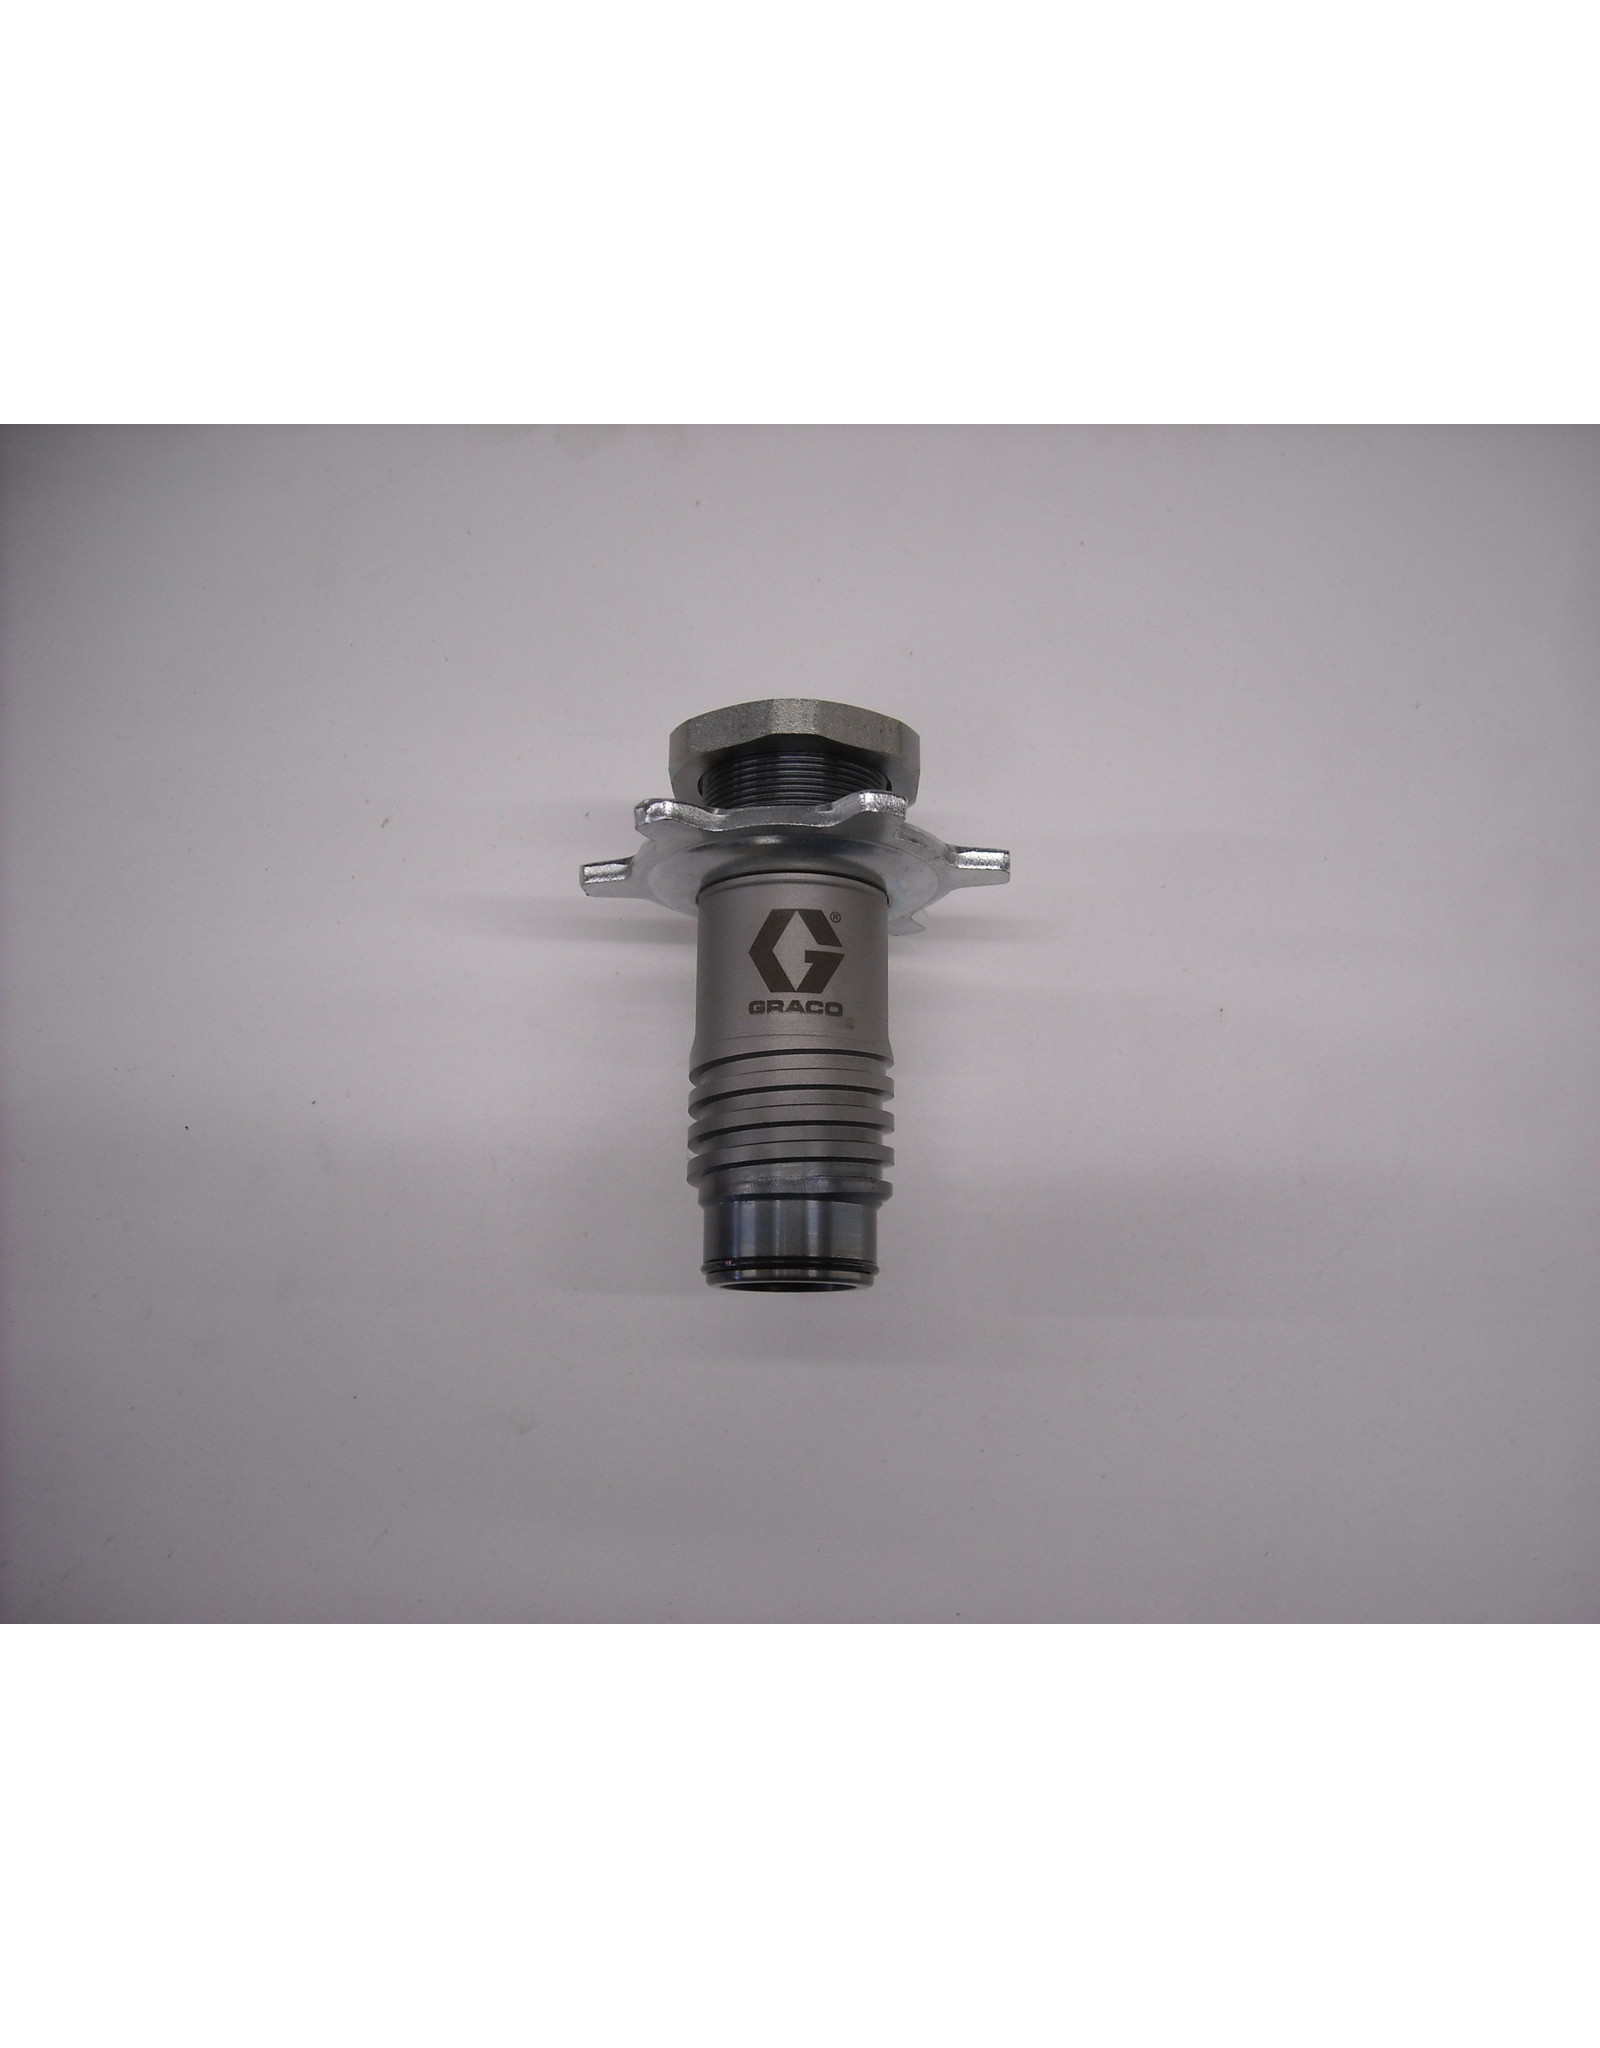 Graco 24W619 OEM Graco 395 /595 PC Cylinder